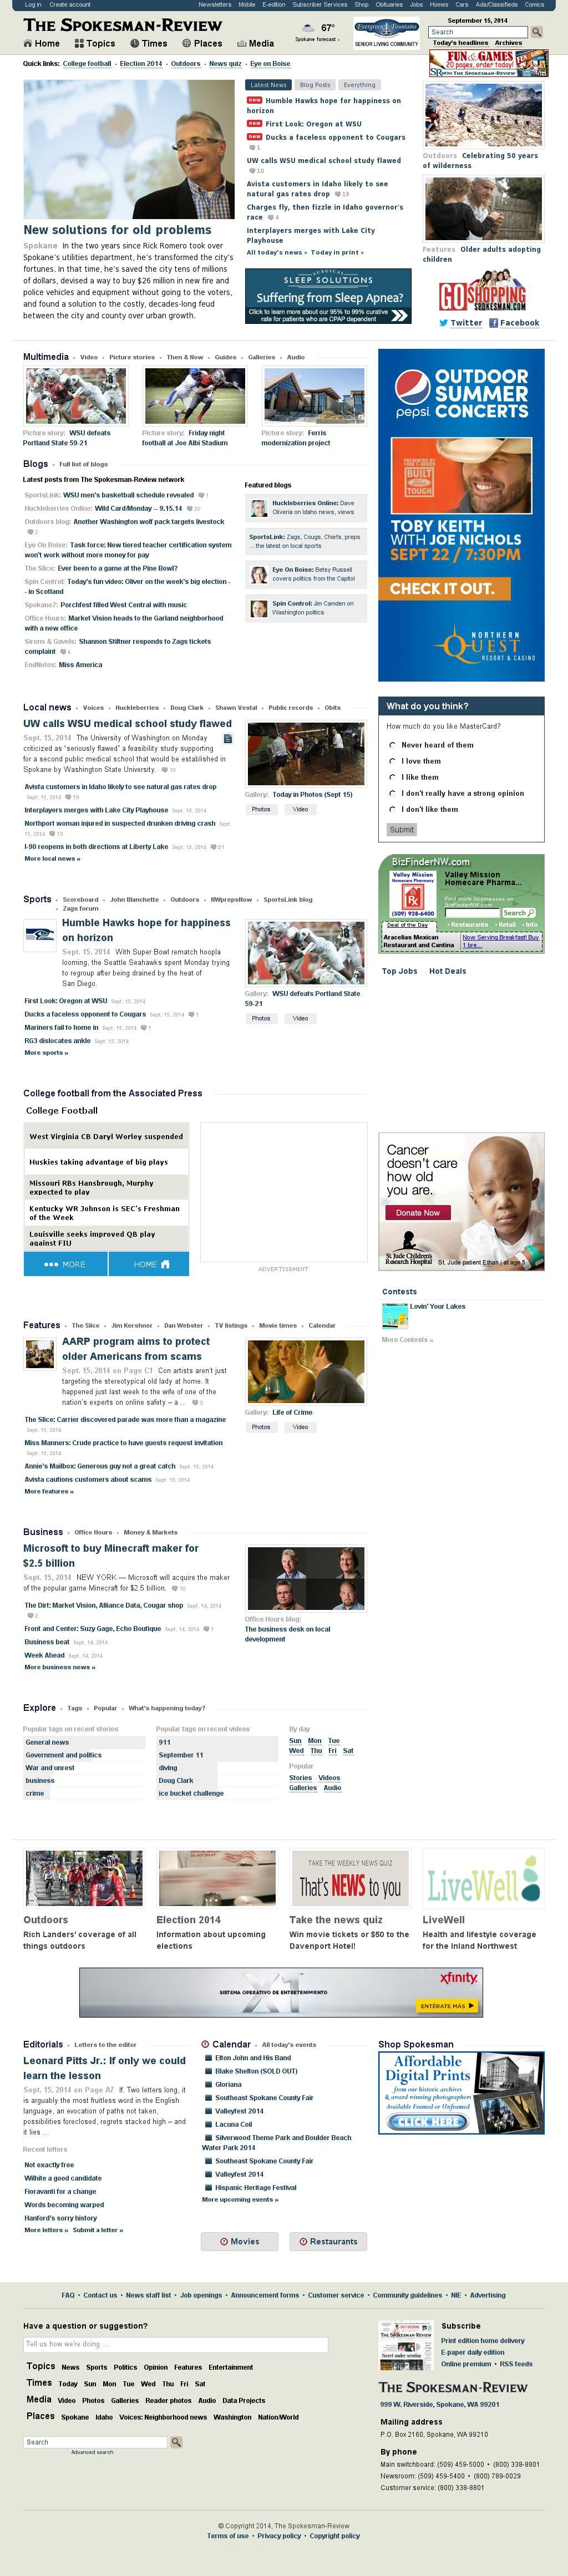 The (Spokane) Spokesman-Review at Tuesday Sept. 16, 2014, 5:17 a.m. UTC